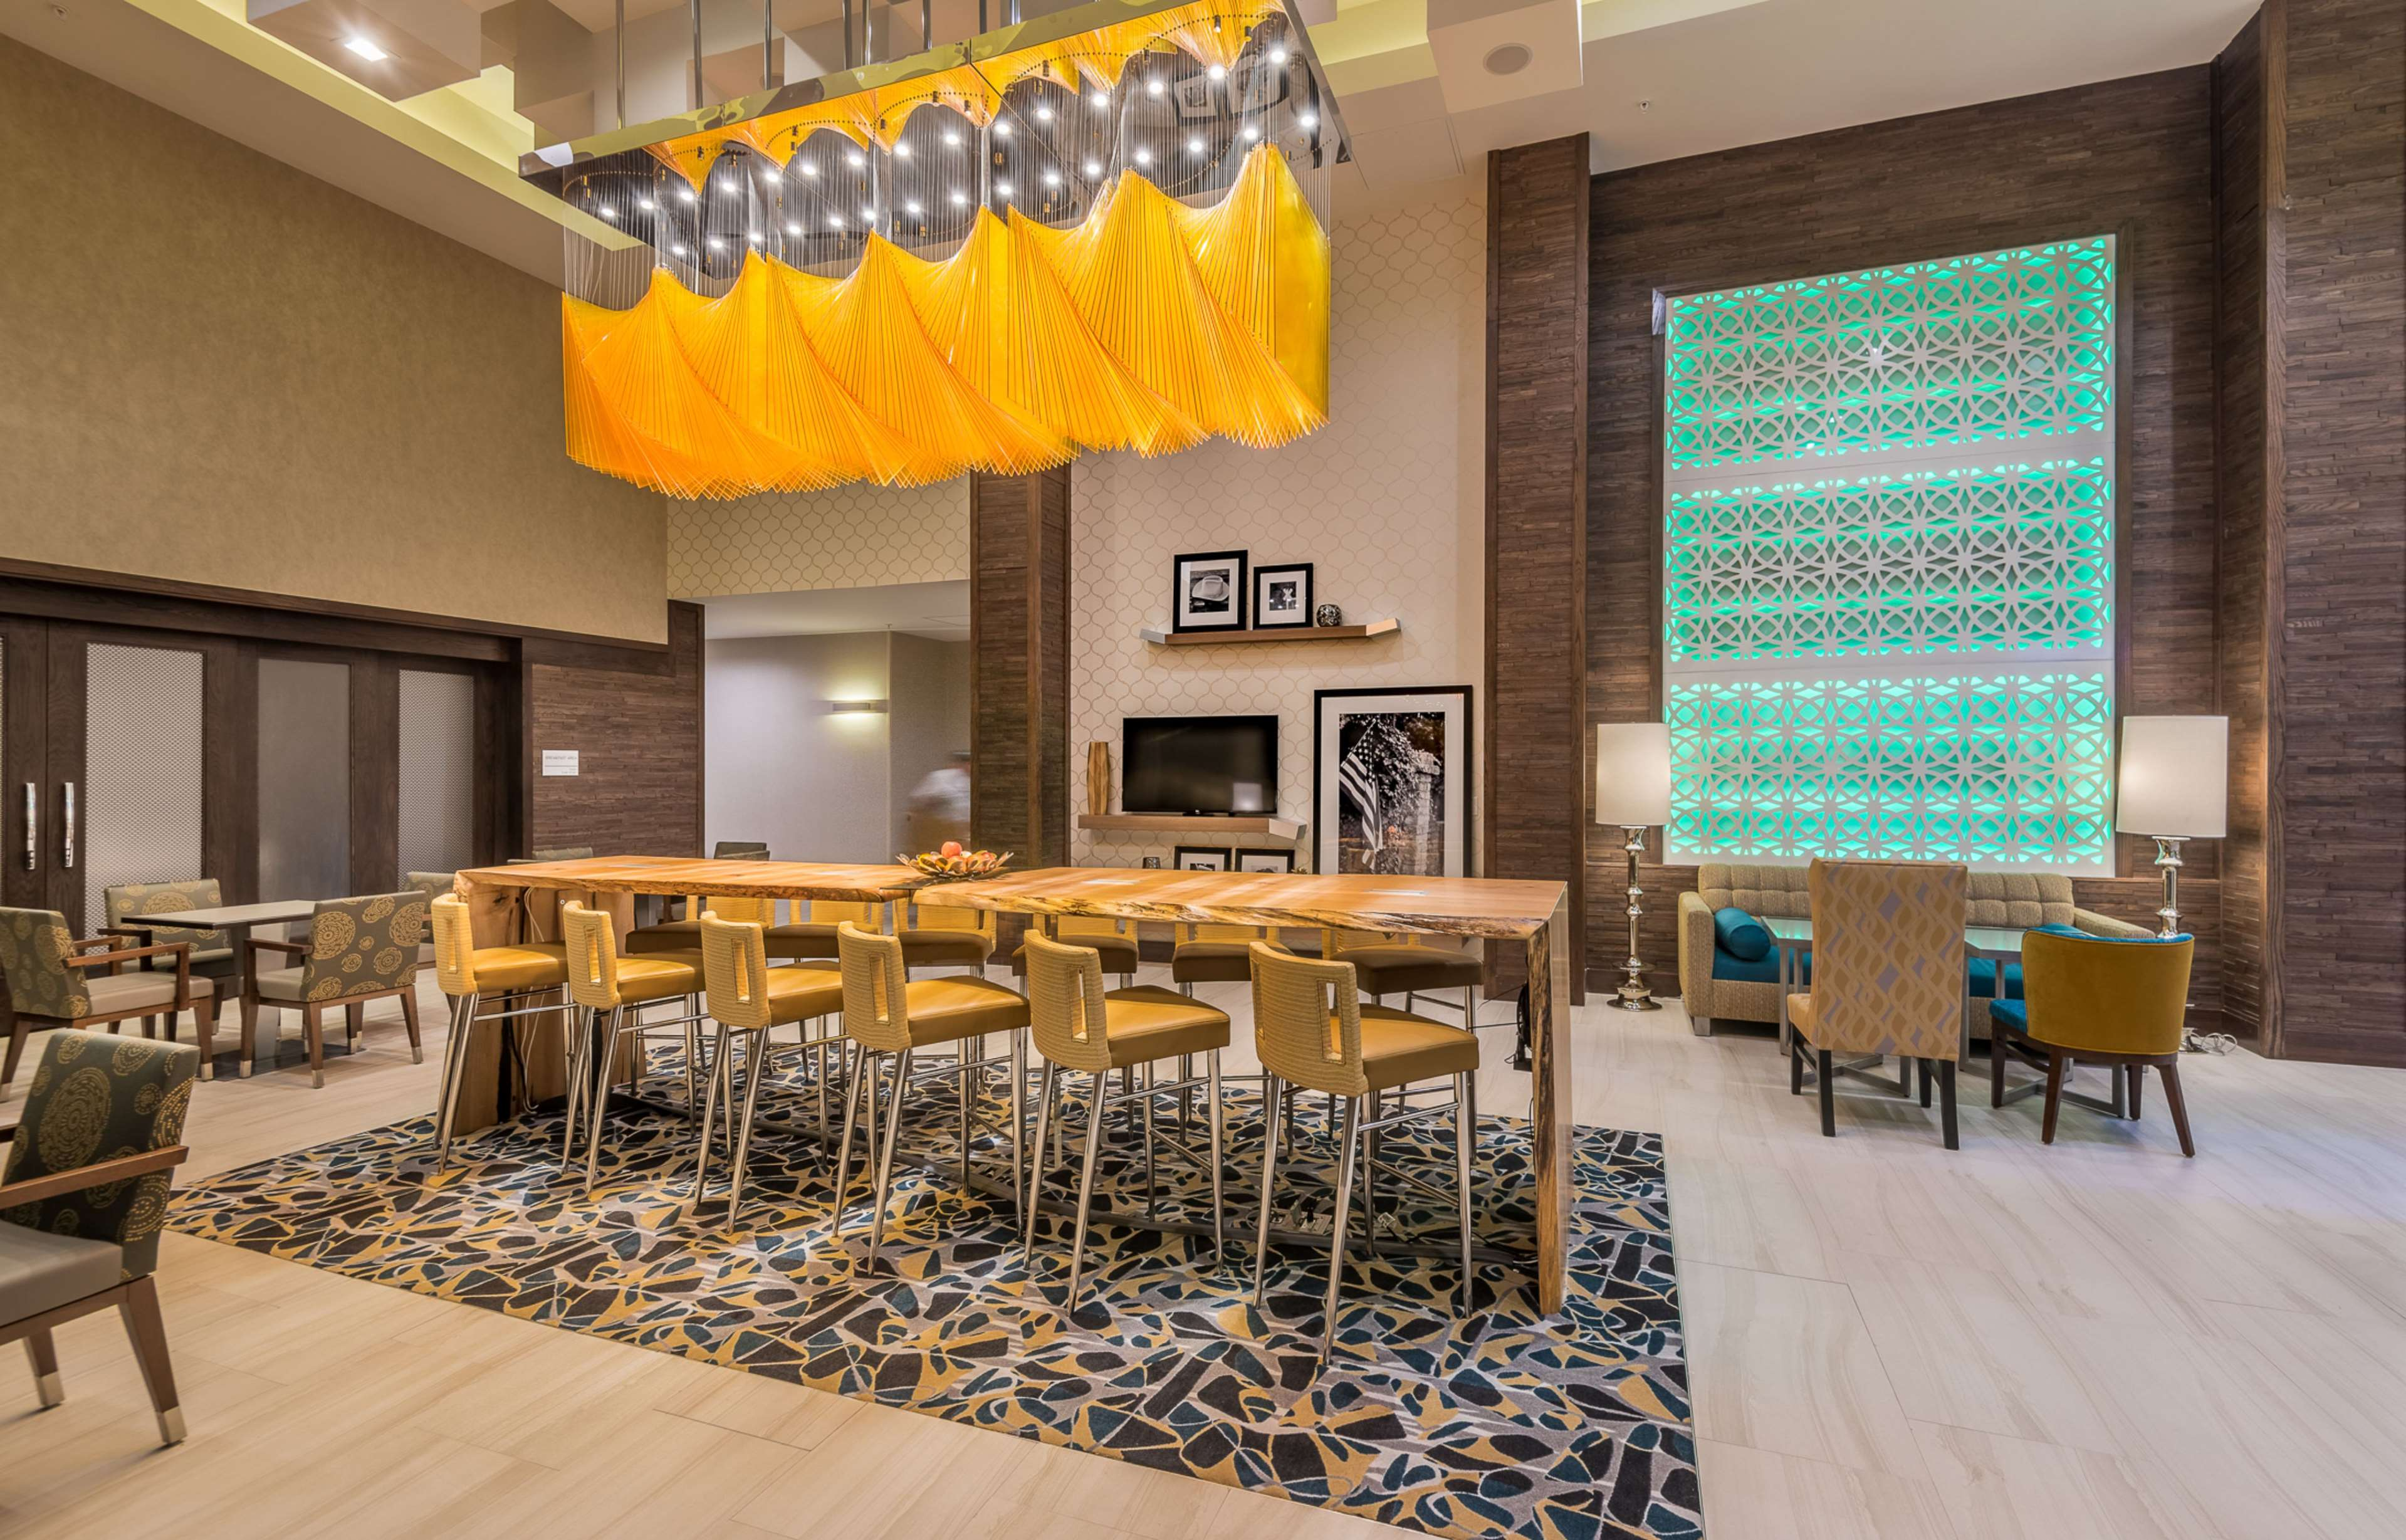 Hampton Inn & Suites Dallas-The Colony, TX image 5